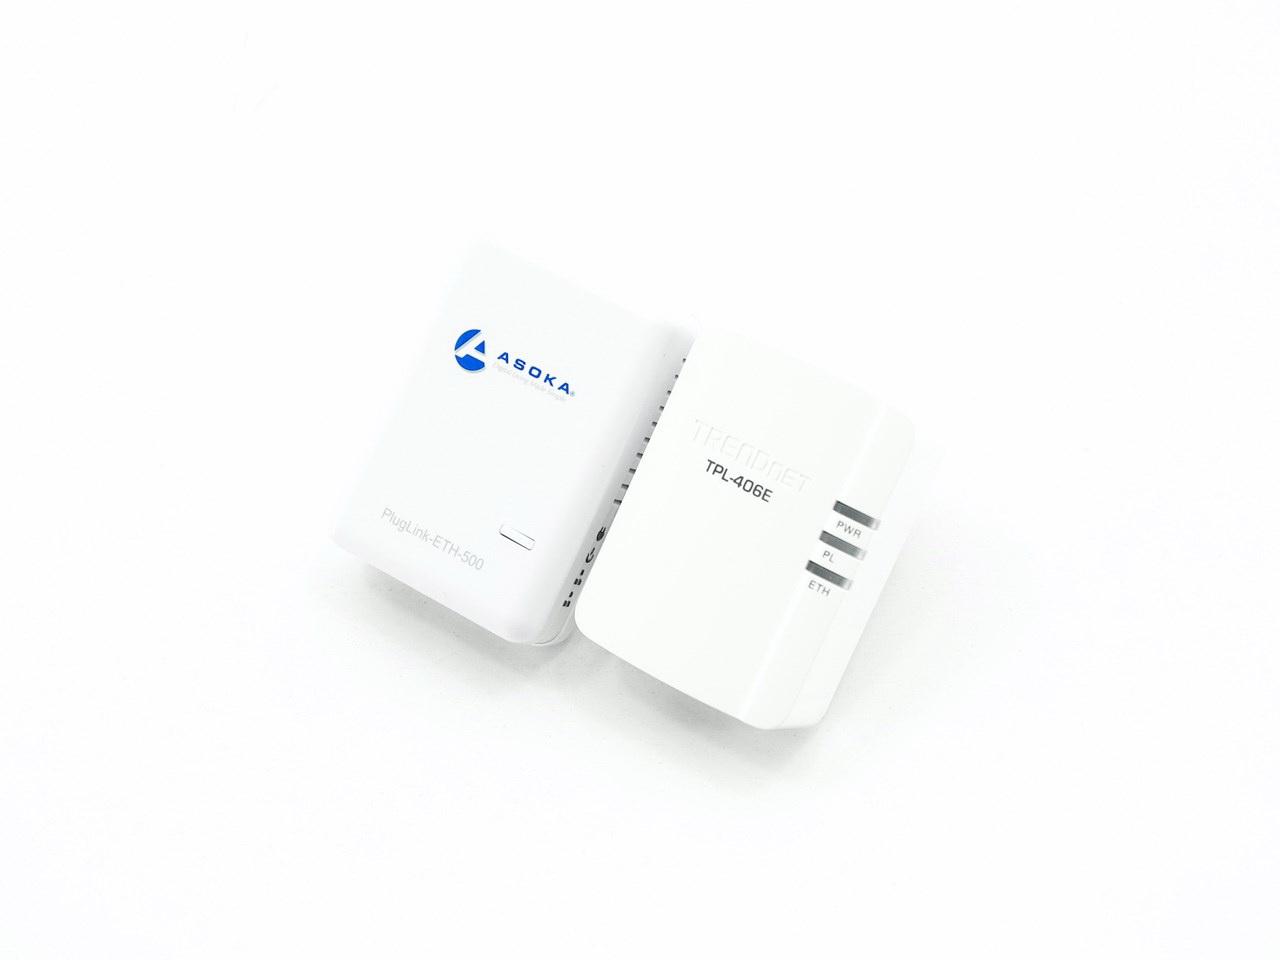 plug power q2 wiring diagram for house asoka pluglink pl9760 500mbps dual ethernet powerline